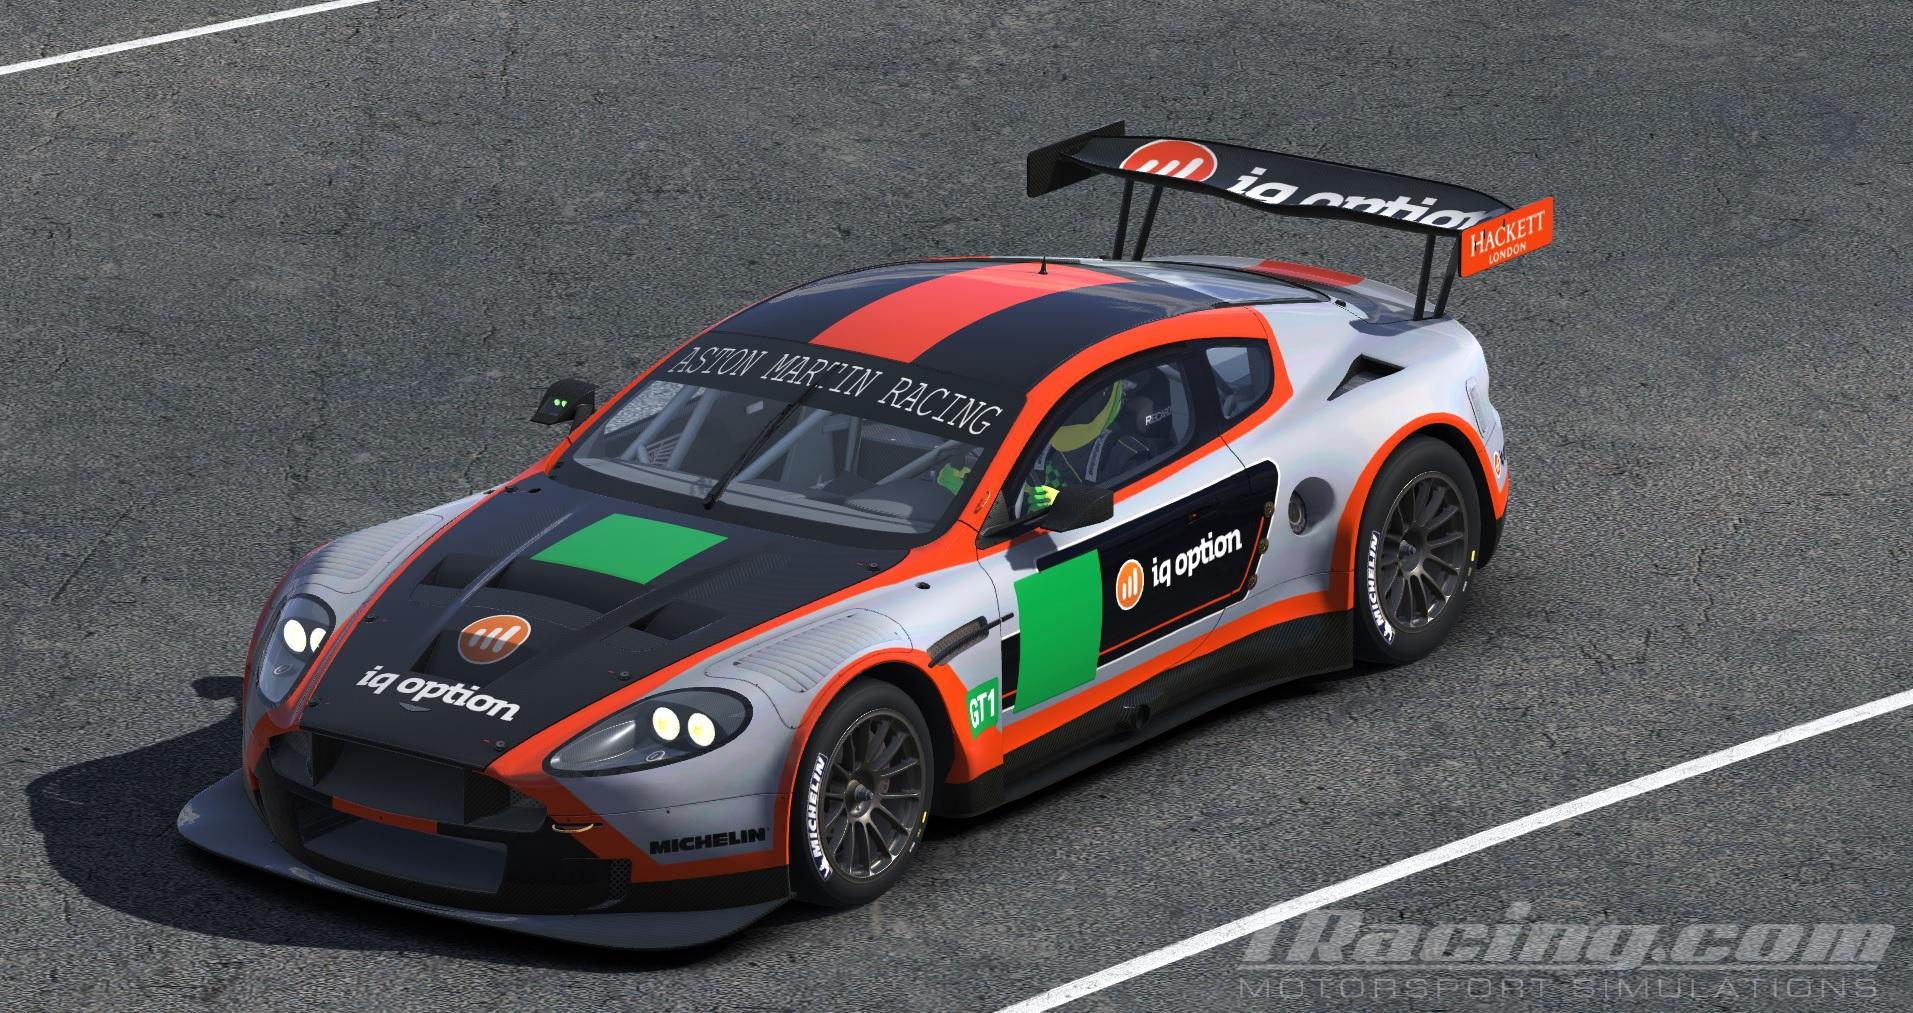 Iq Option Aston Martin Dbr9 Gt3 By Chris Bull Trading Paints